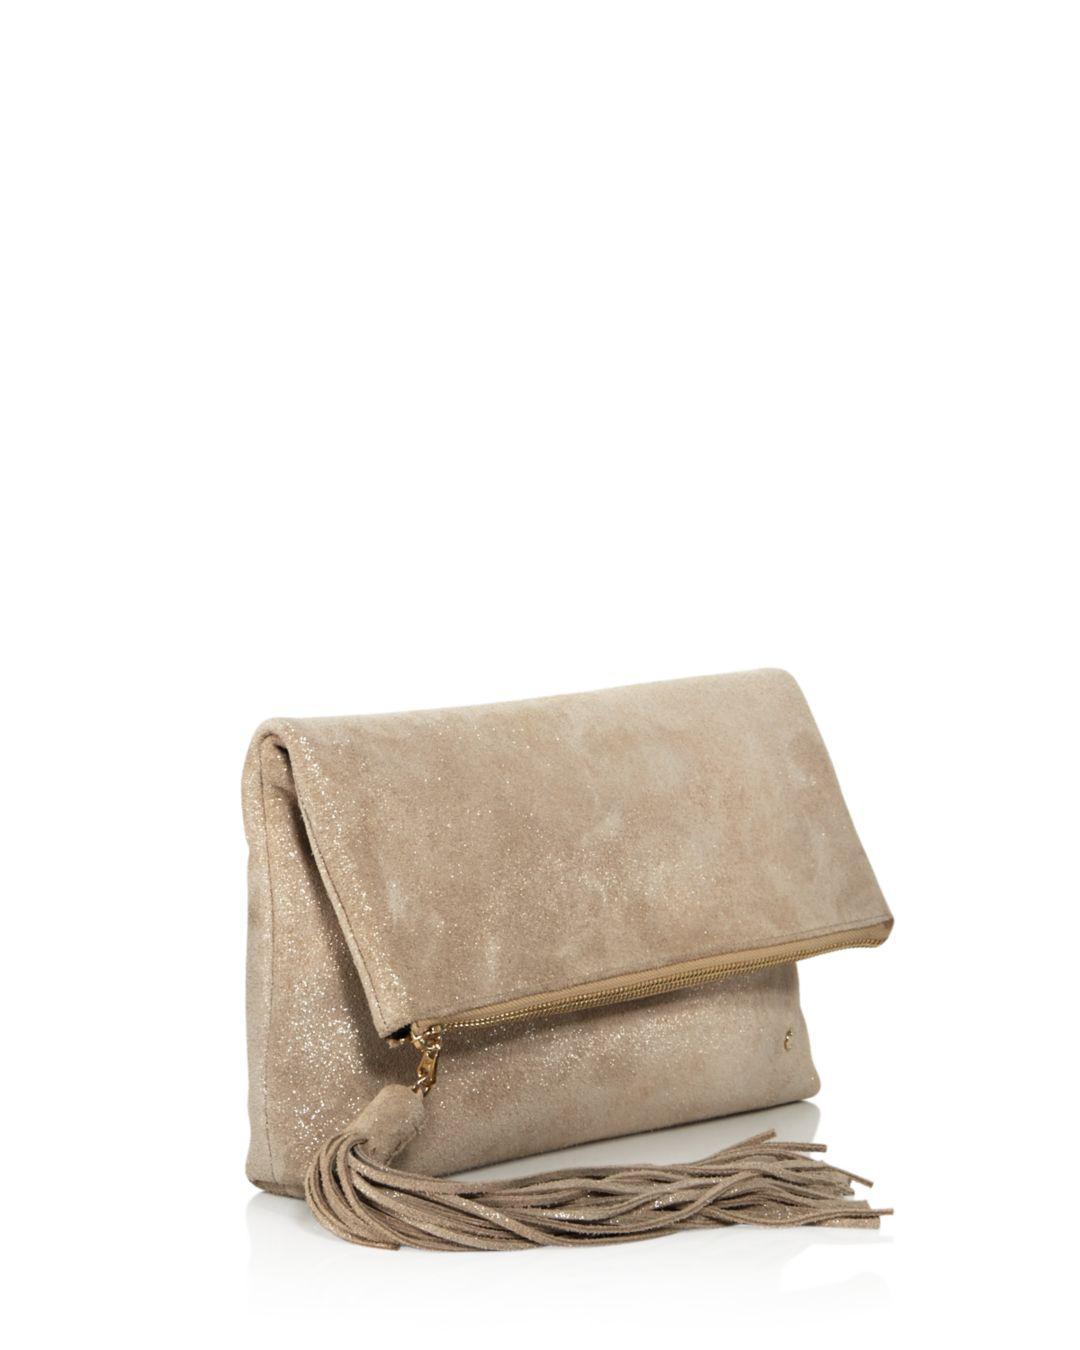 b410d240d Halston Christie Leather Foldover Clutch in Metallic - Lyst